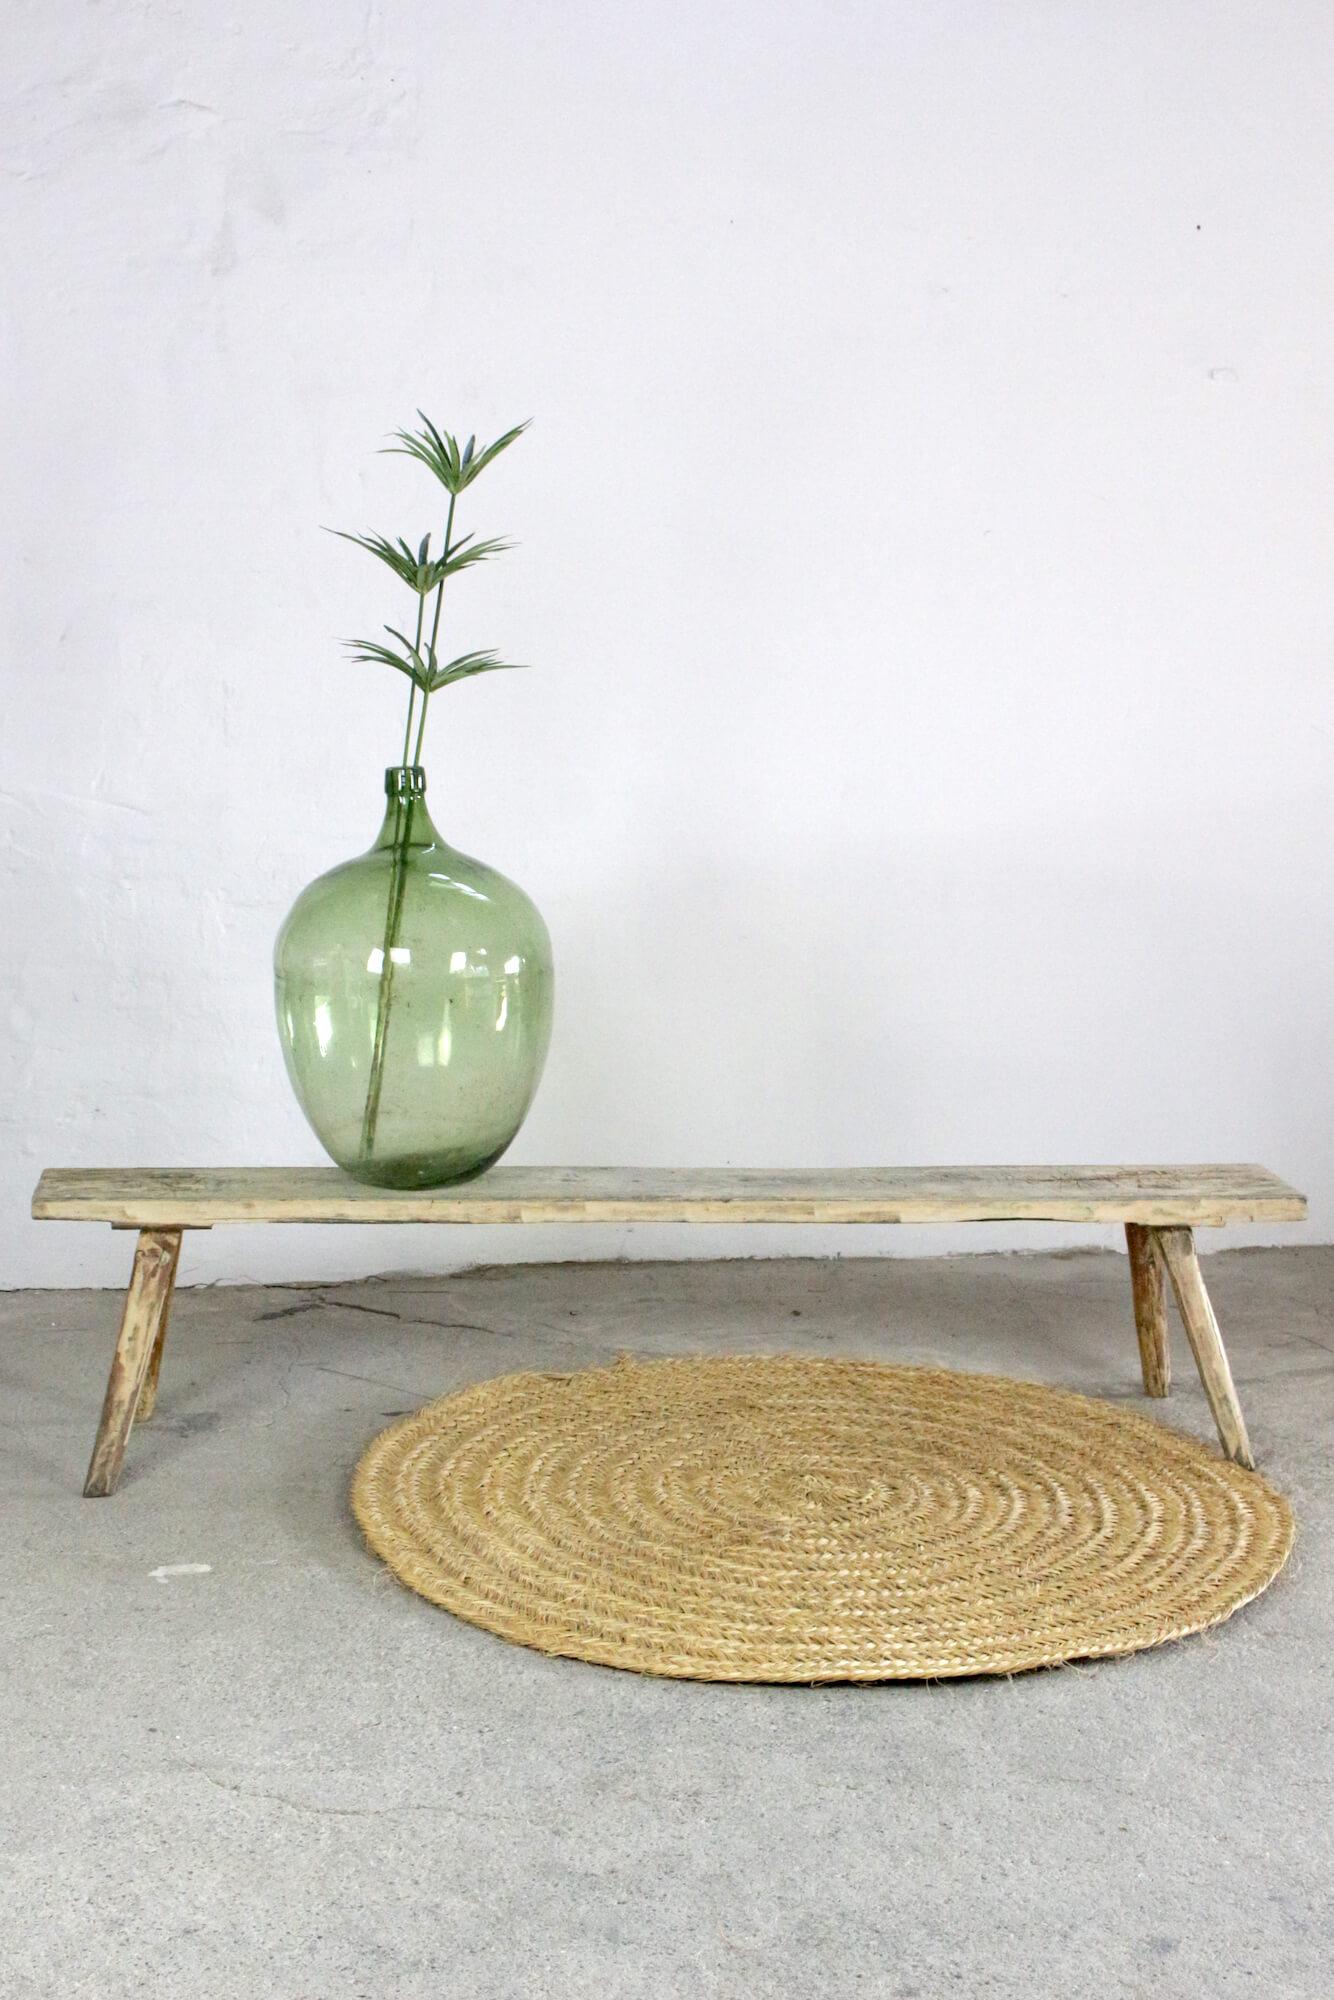 Antike Holzbank Wabi Sabi, 200 cm